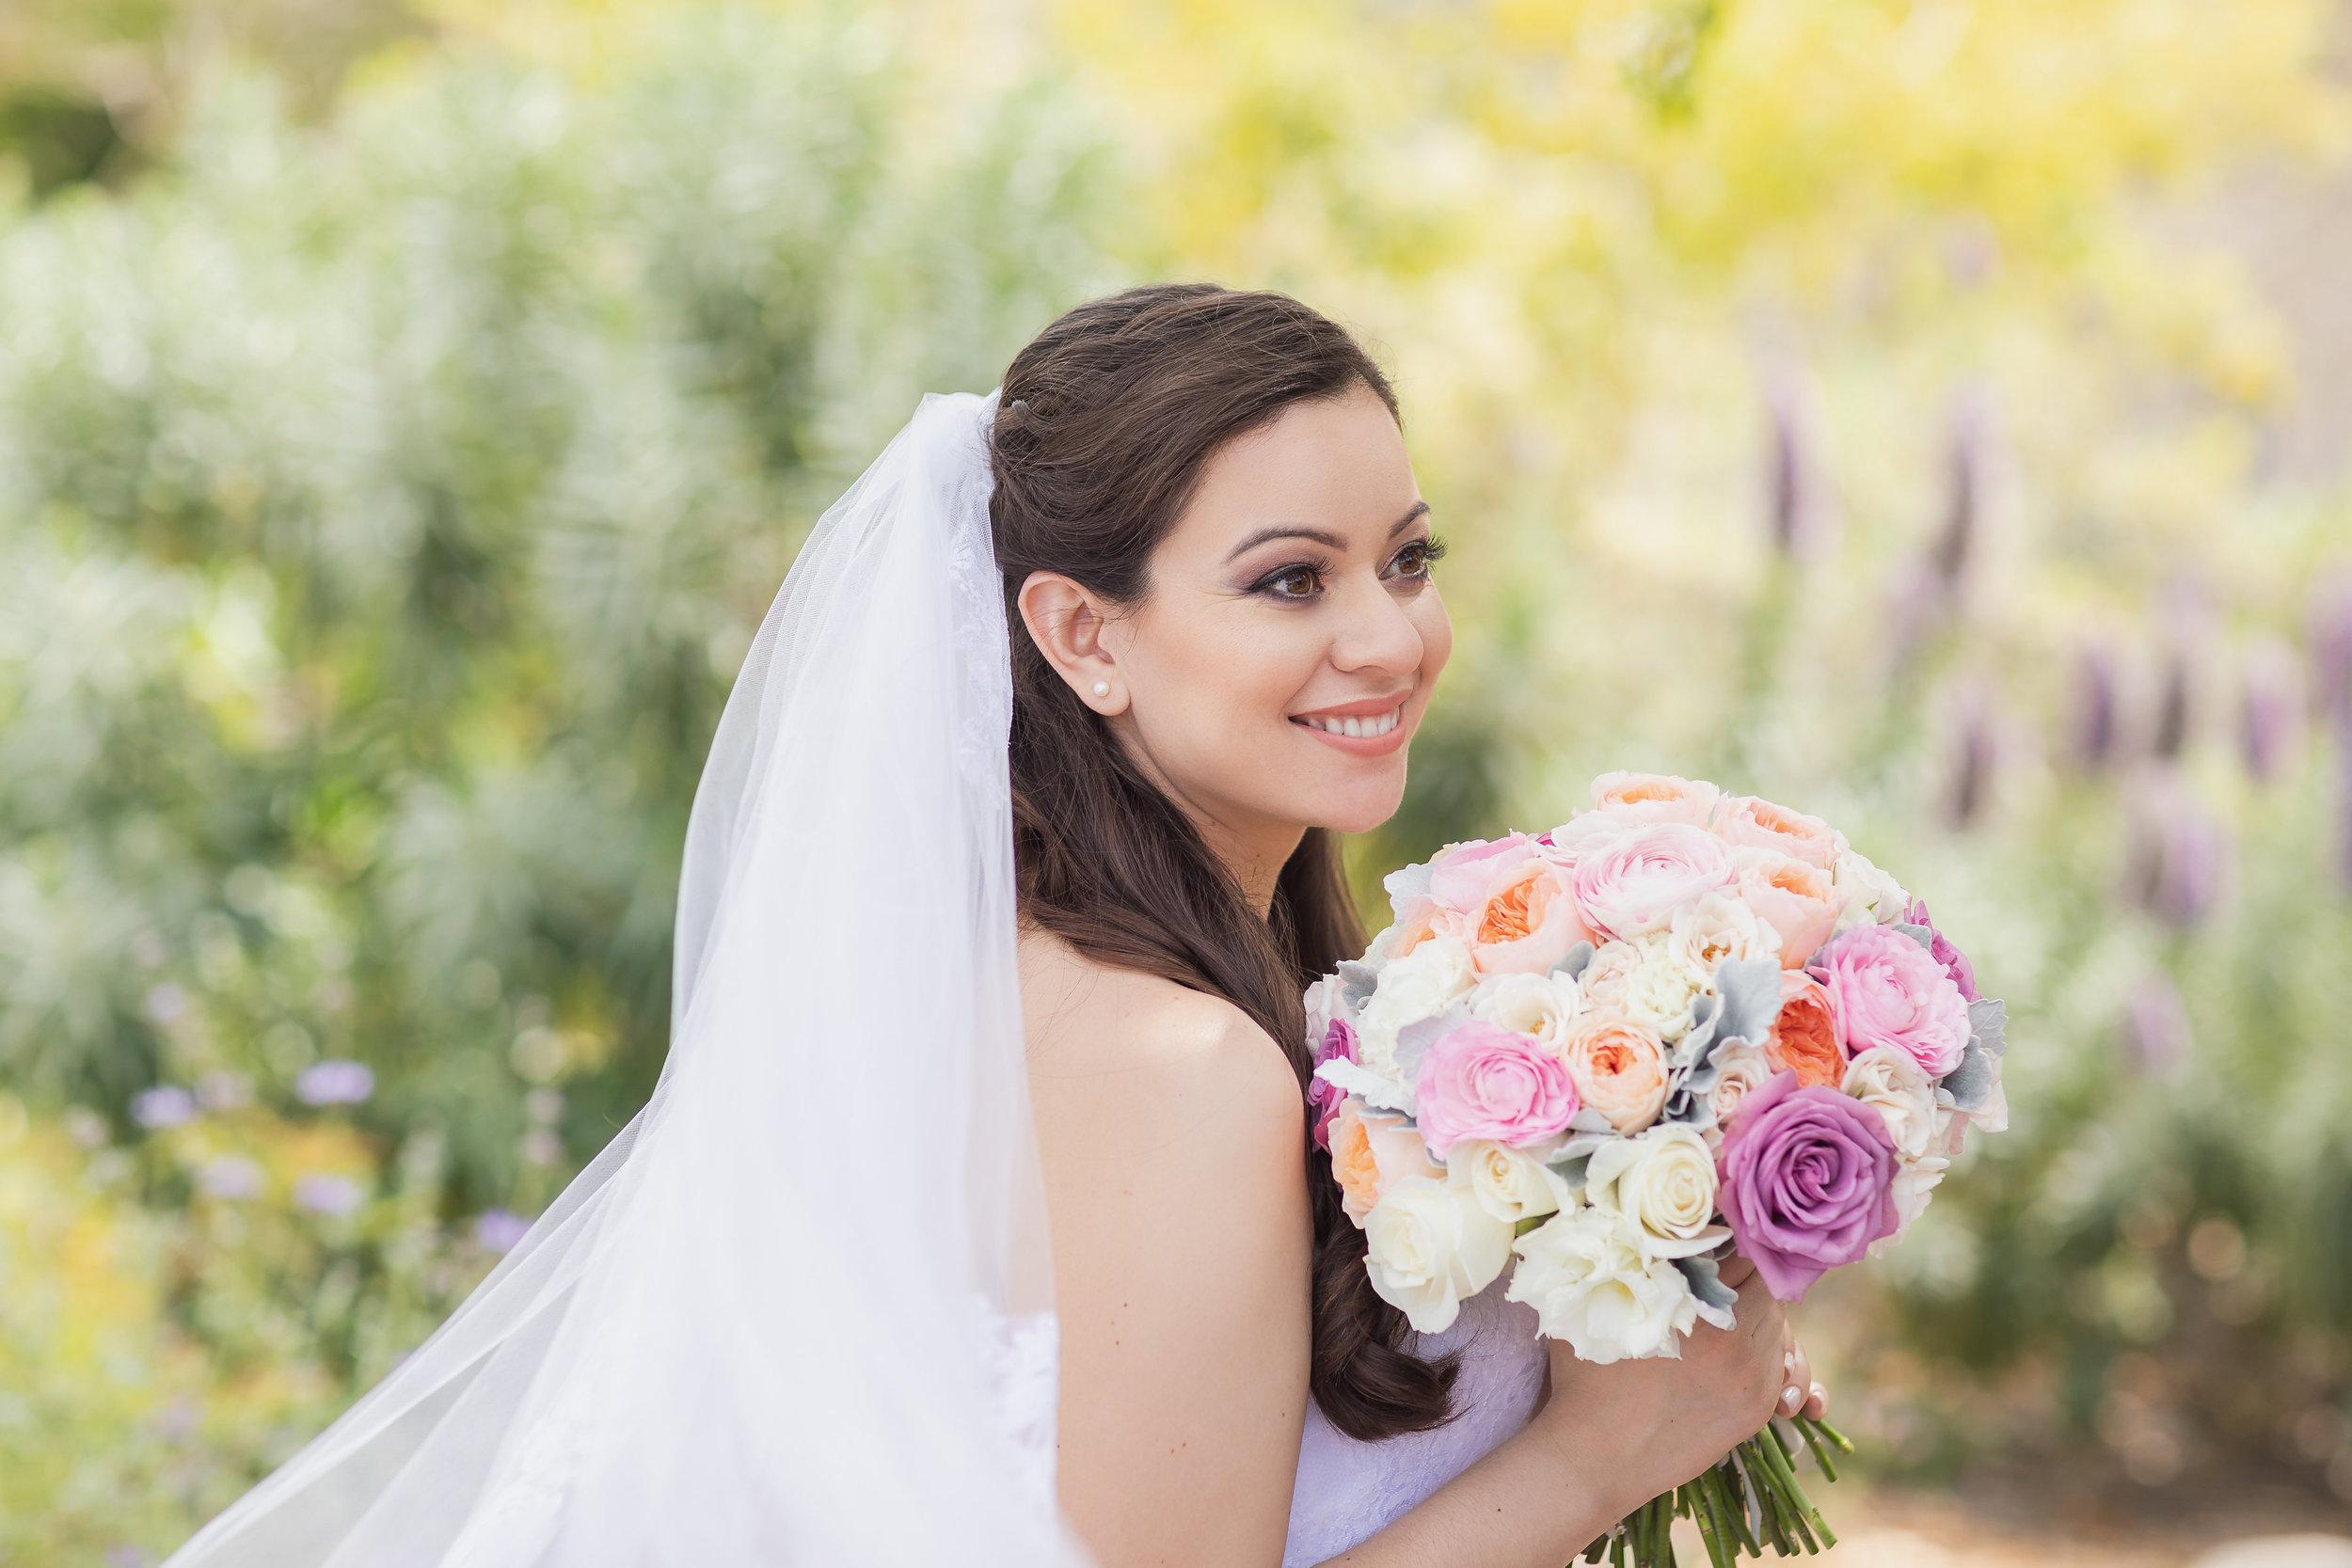 Pretty bride with bouquet.jpg